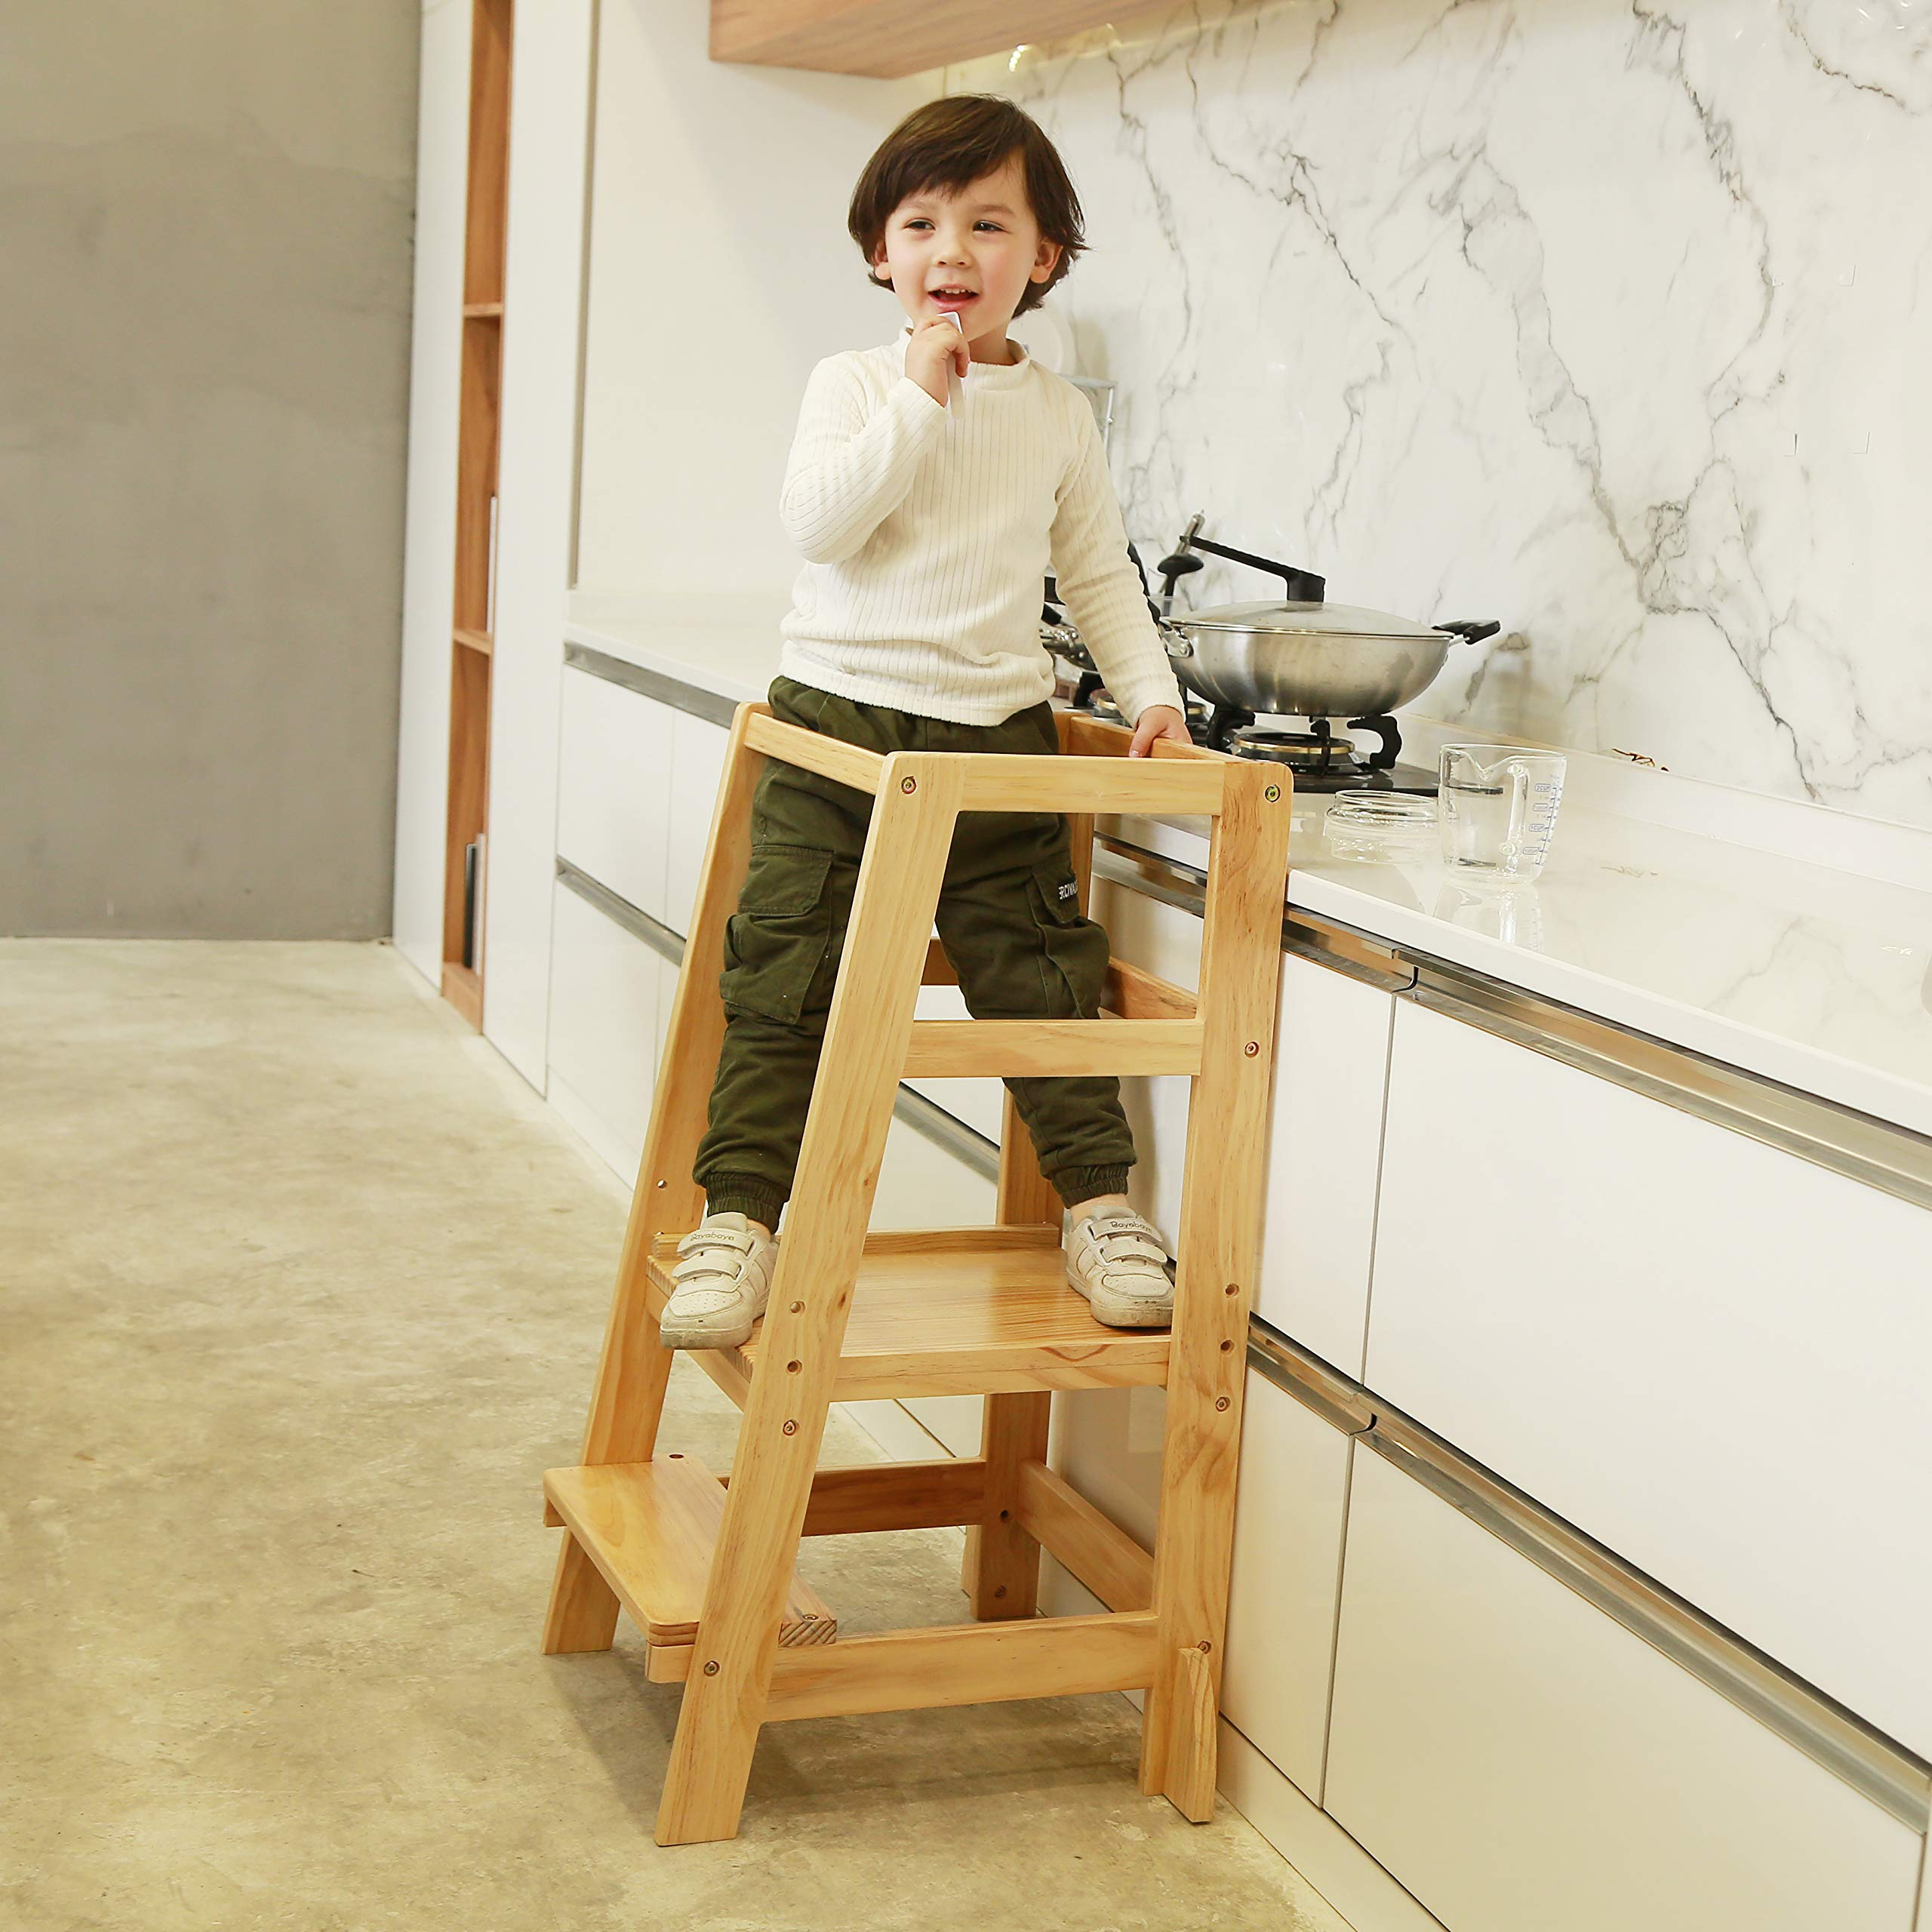 SDADI Kids Step Stools Kitchen Standing Tower Mothers' Helper, Natural LYT06N